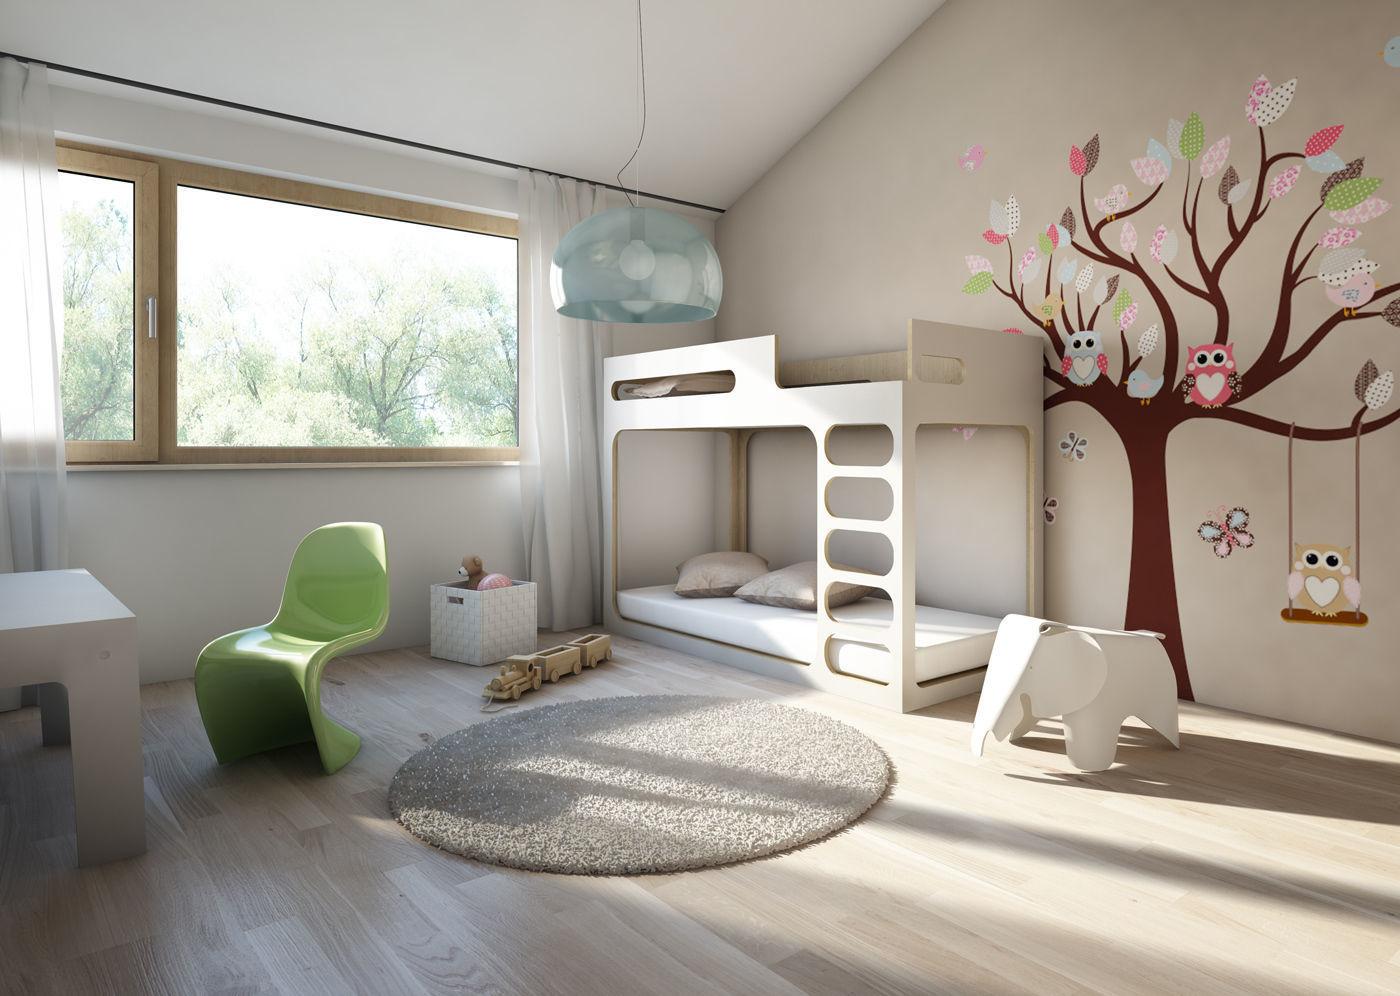 Fabelhaft Hochbett Modern Ideen Von Perludi Bed For Children - Bunk Bed